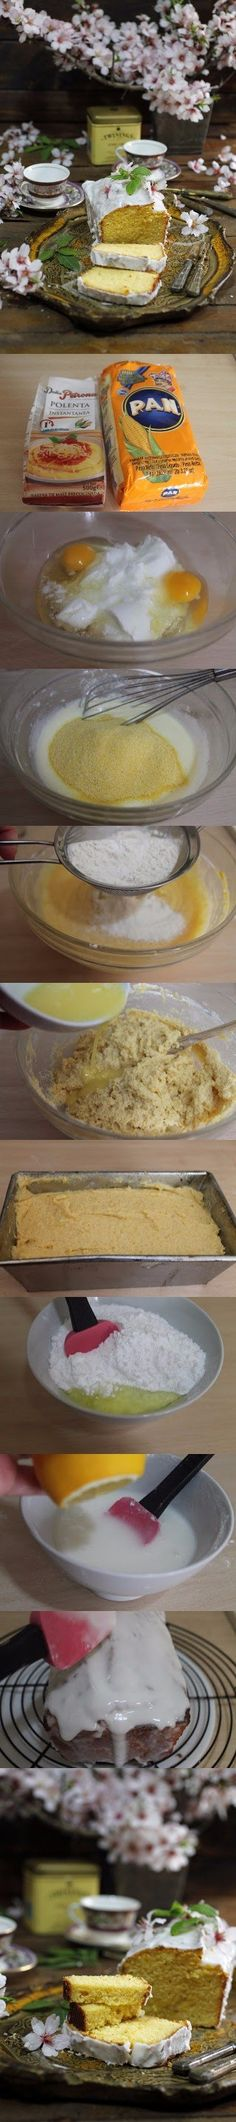 Exquisito bizcocho de harina amarilla / http://cakesparati.blogspot.com.es